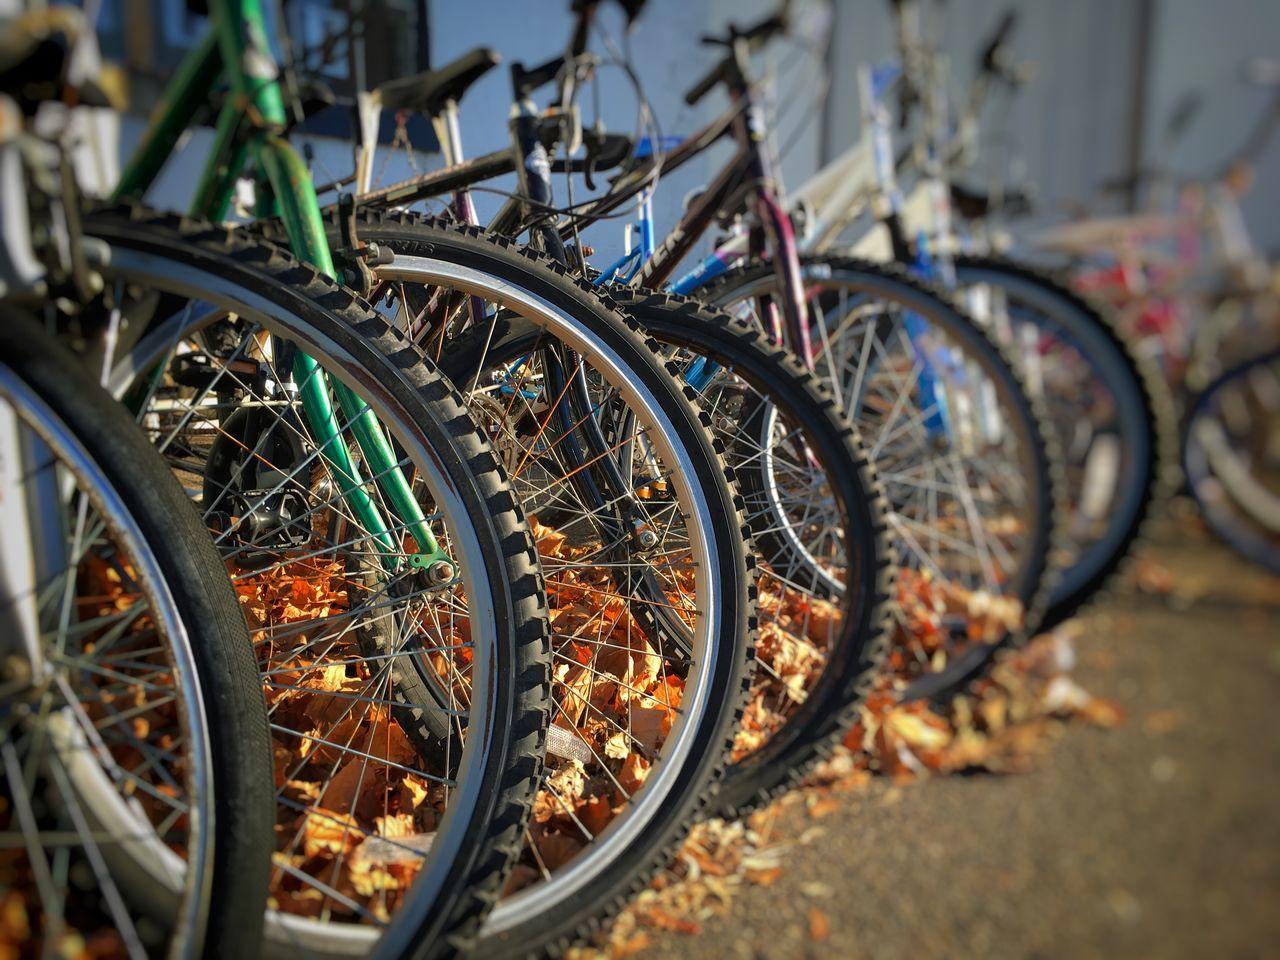 In A Row Bike Bikes Wheels Bicycle Spokes Ipstransport